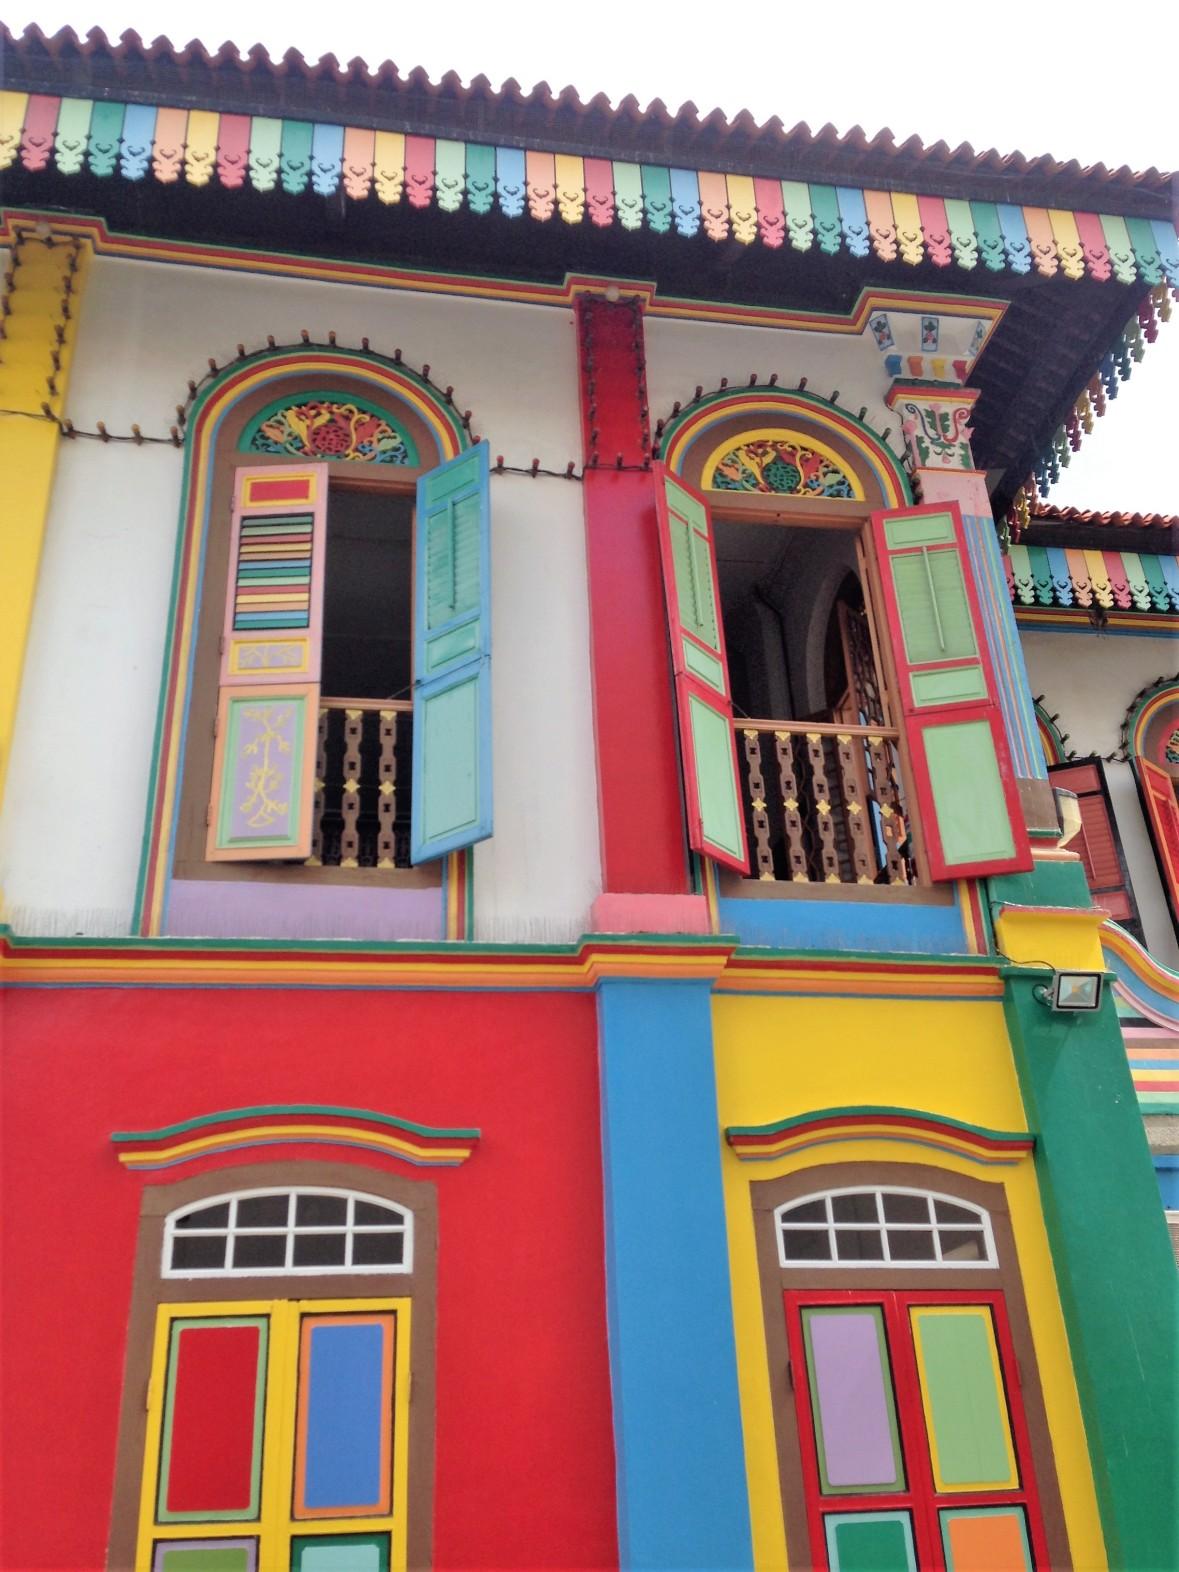 Singapour - LIttle India (3)